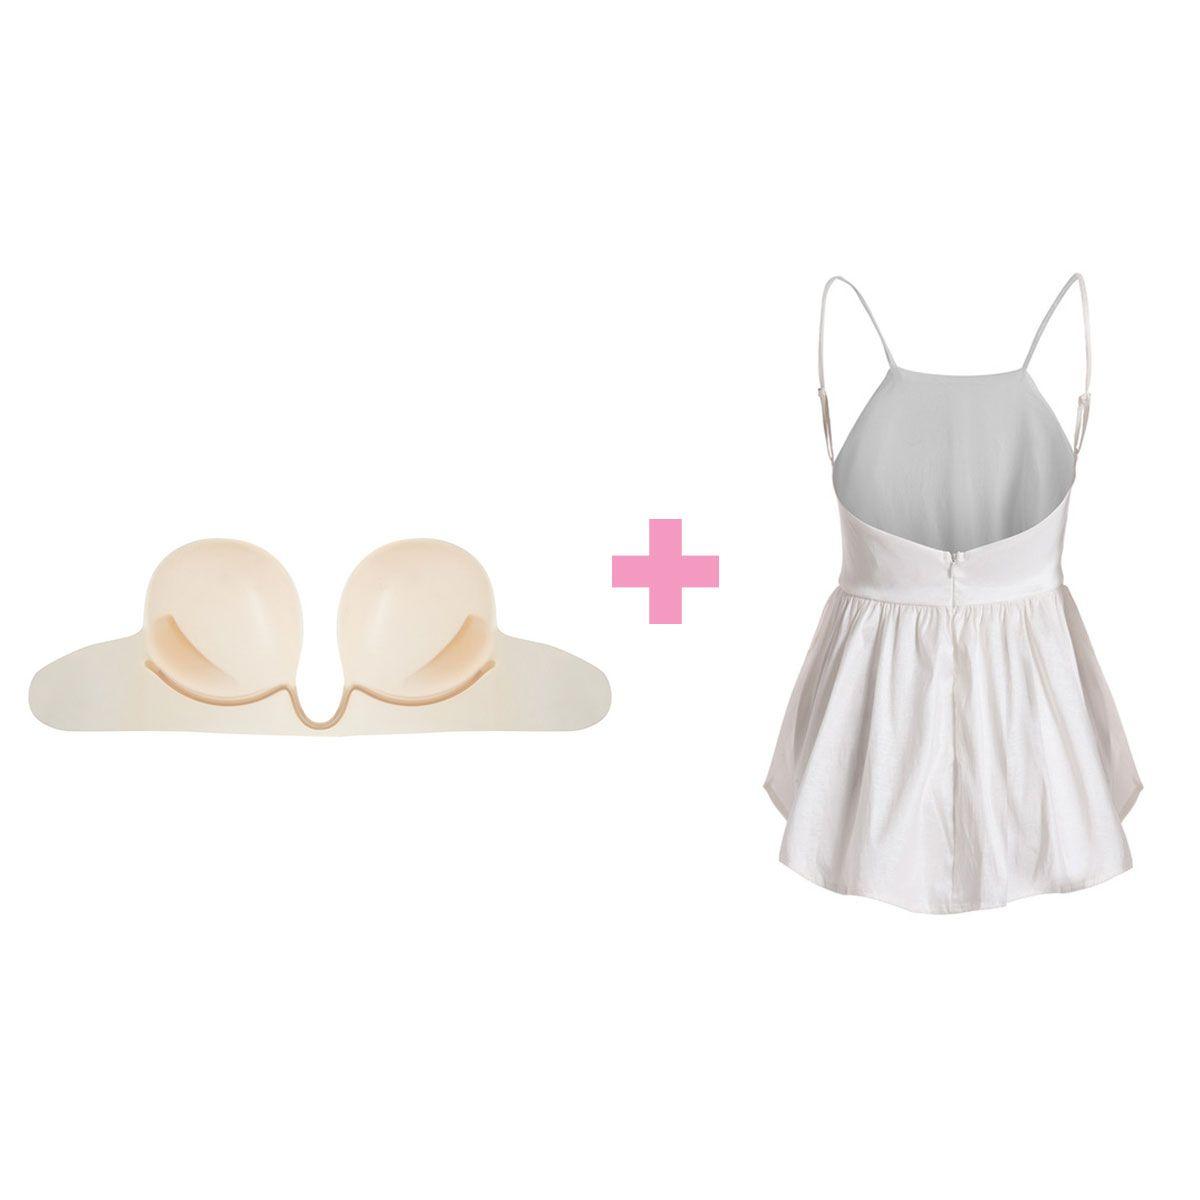 208713d01f What Color Bra Do U Wear Under A White Shirt - Cotswold Hire